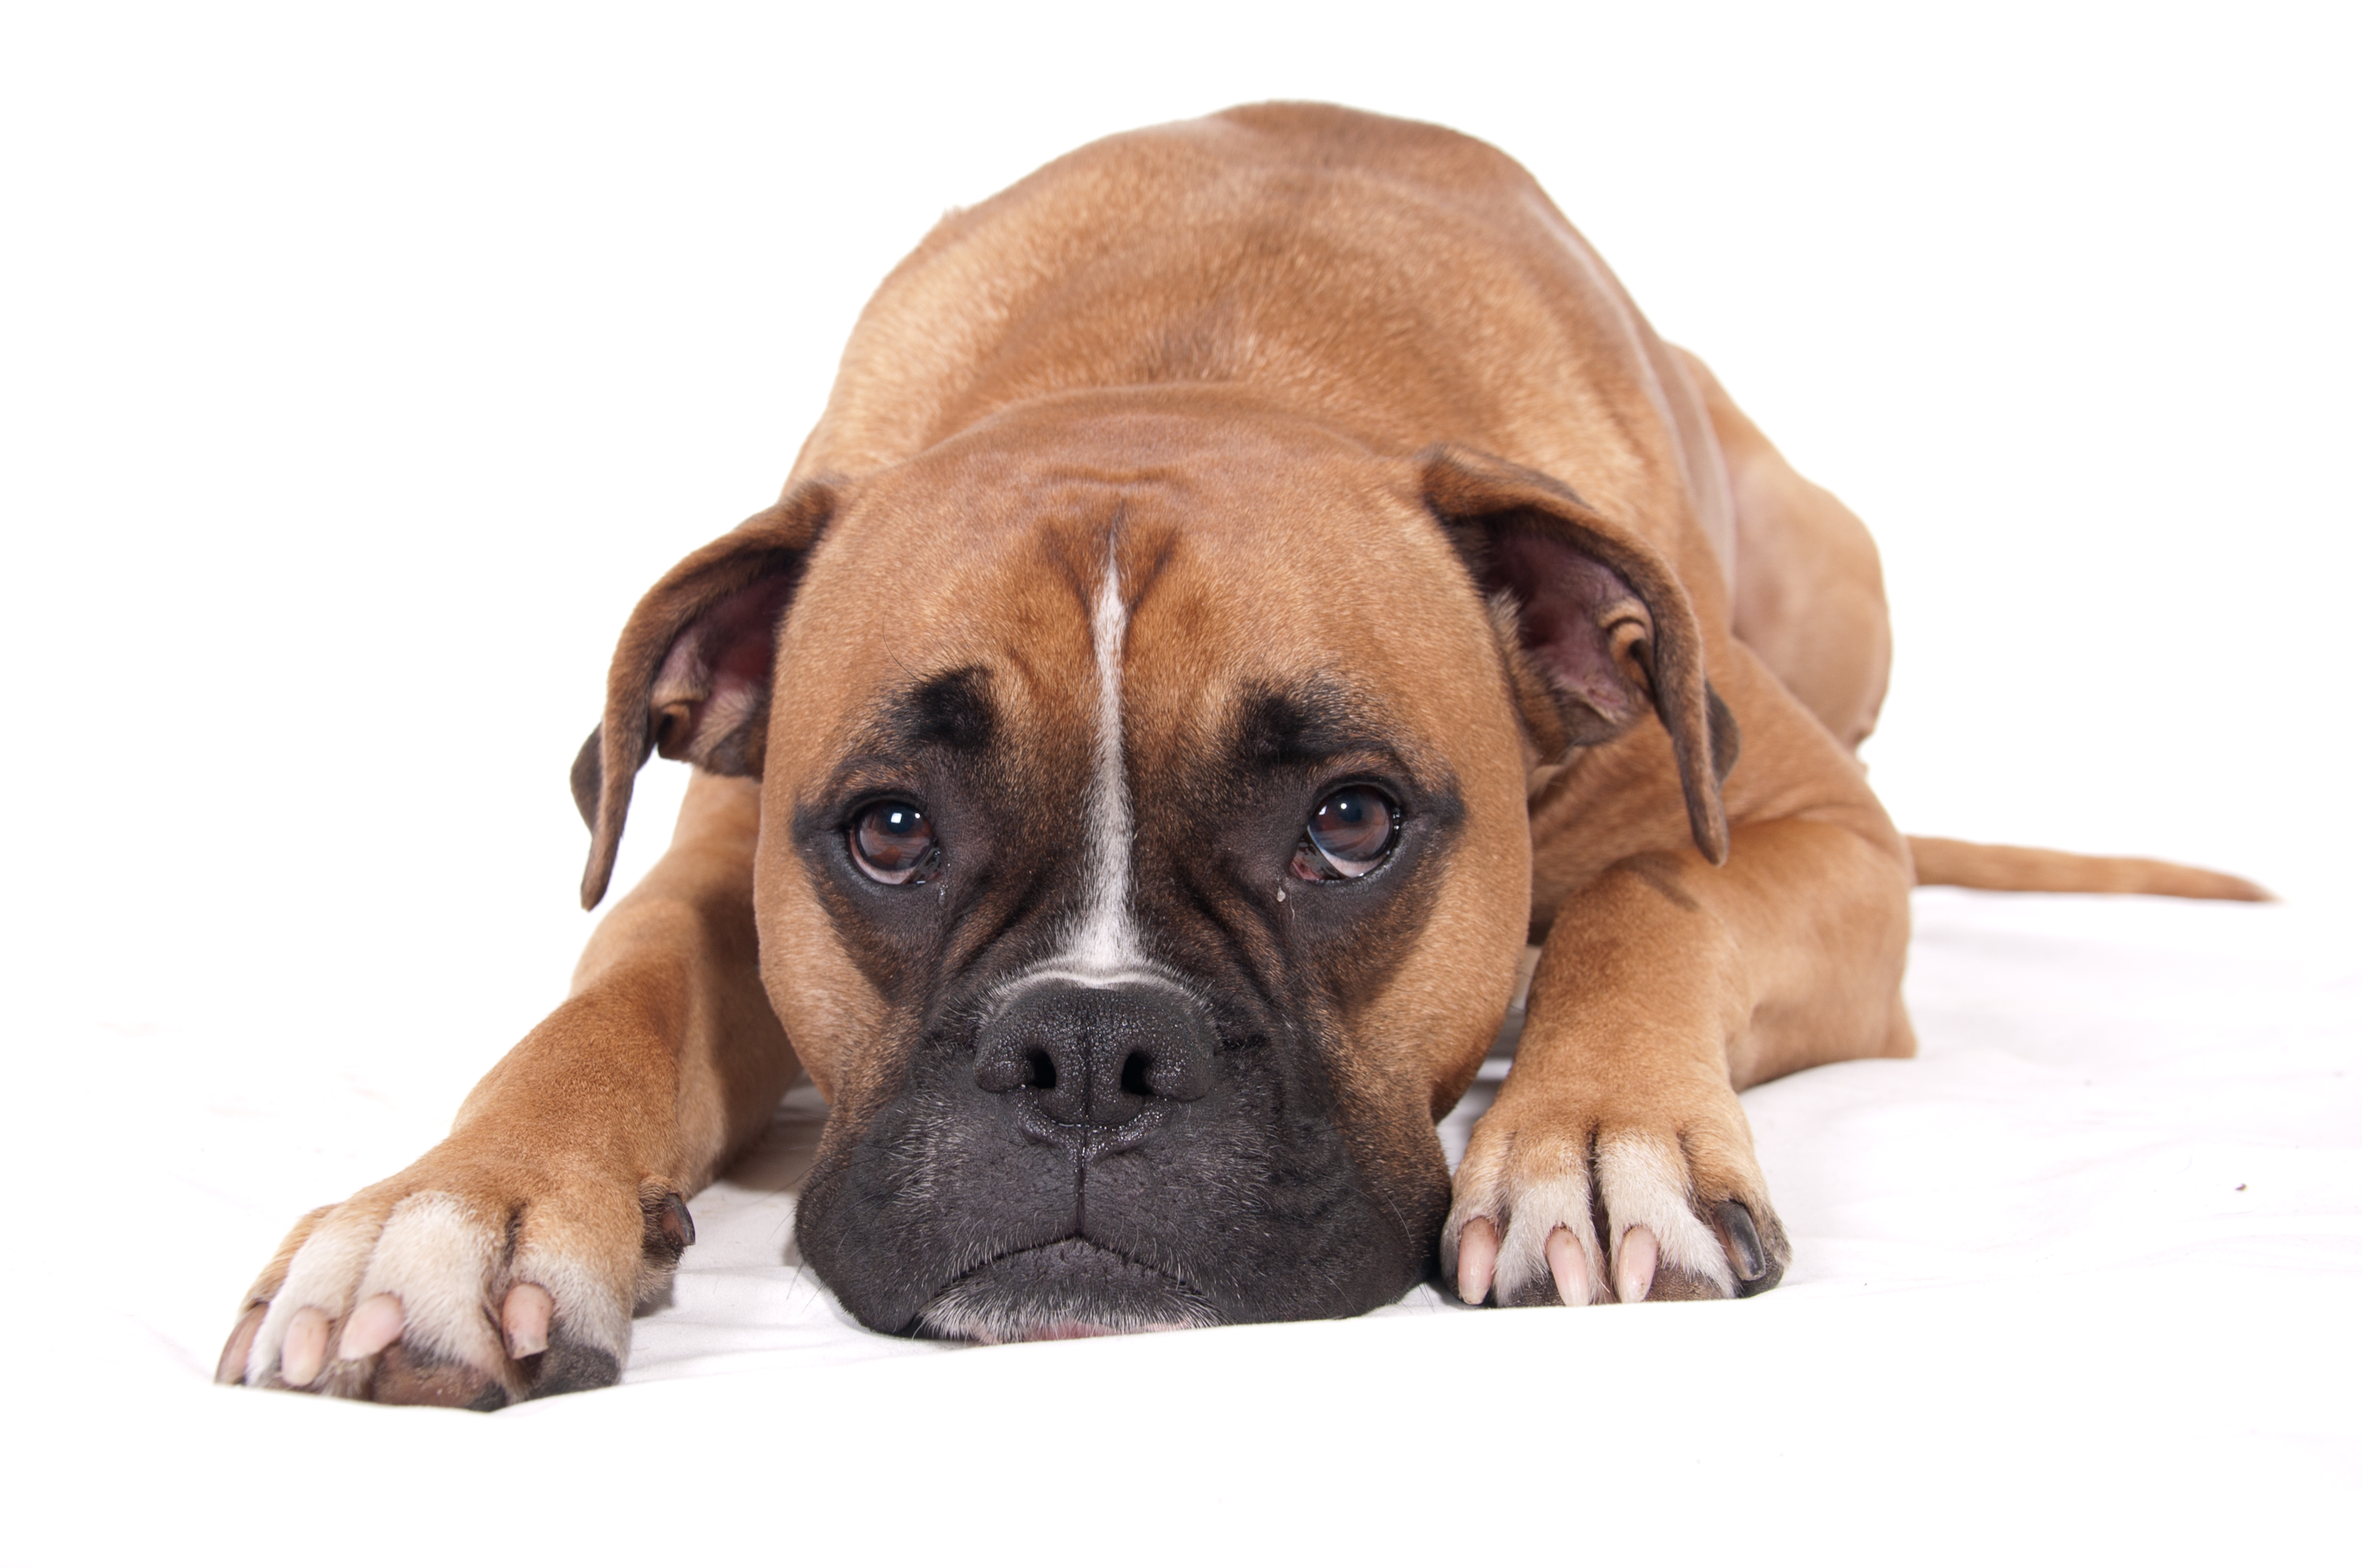 stockvault boxer dog lying down131801